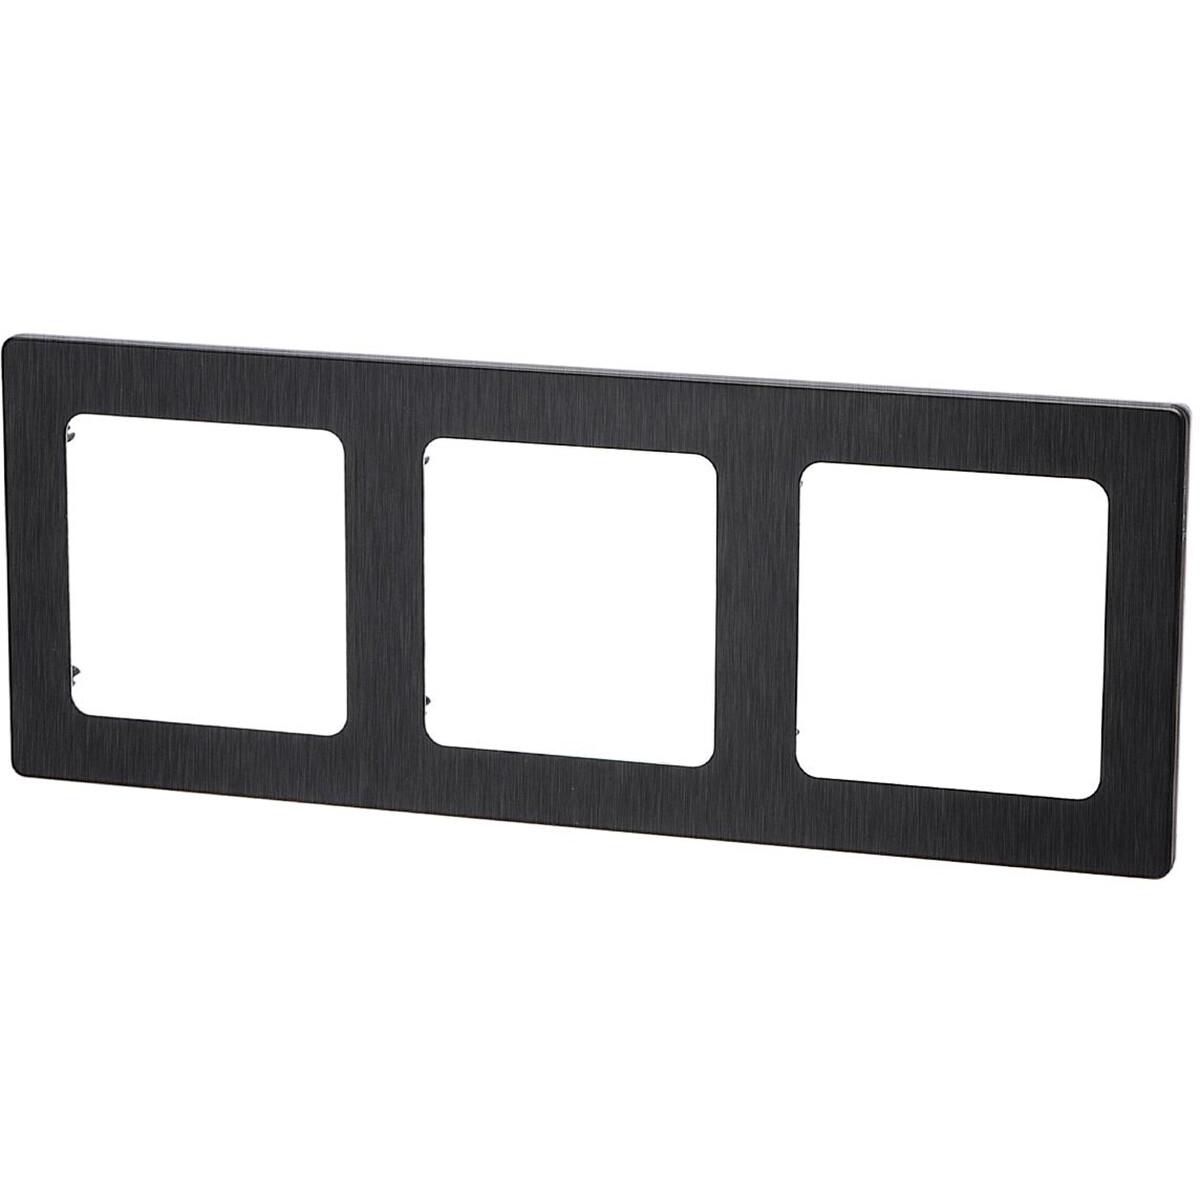 Afdekraam - Aigi Jura - 3-voudig - Vierkant - Aluminium - Zwart